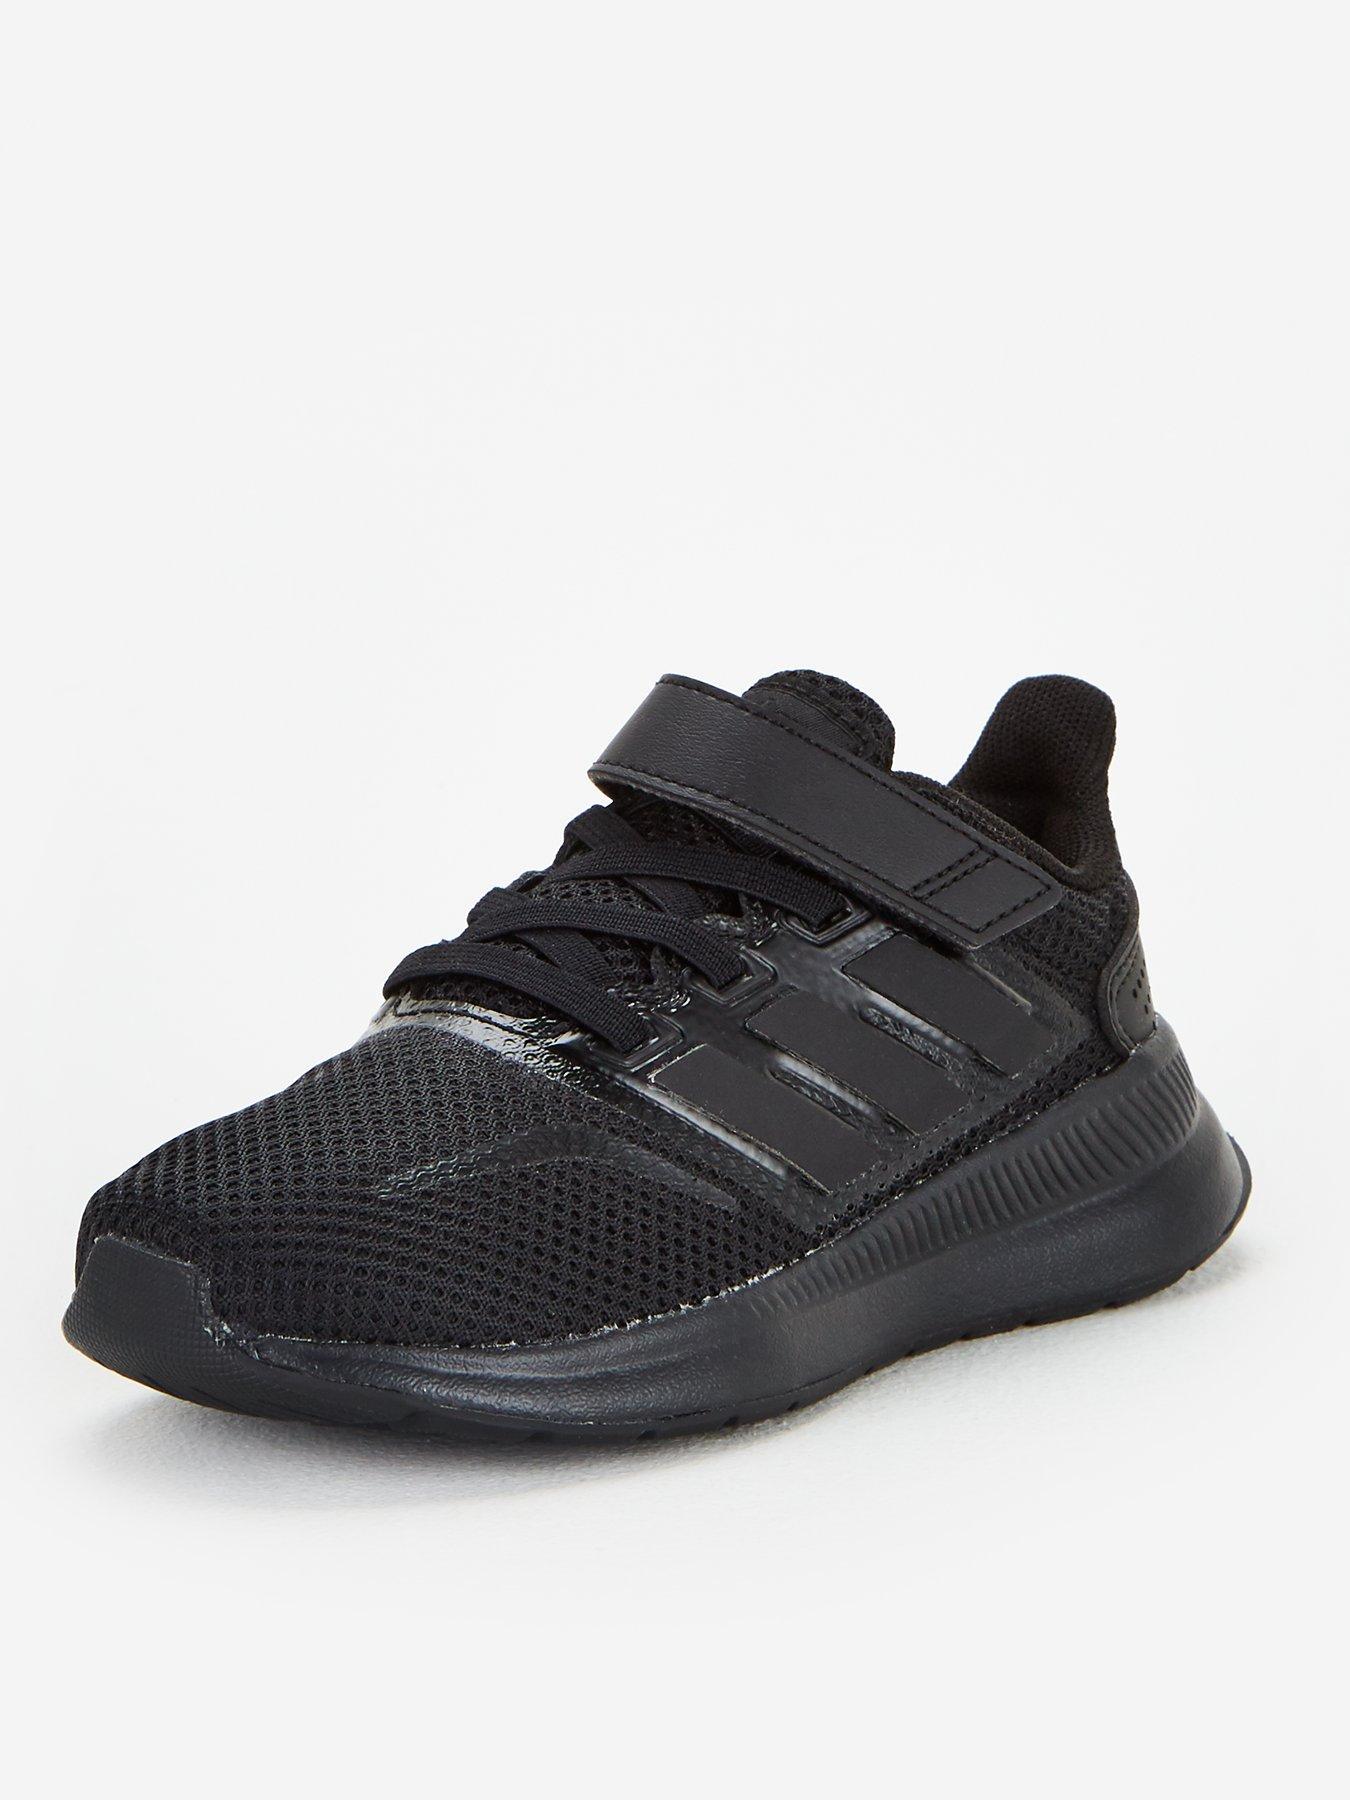 Adidas   Kids footwear (sizes 10-2